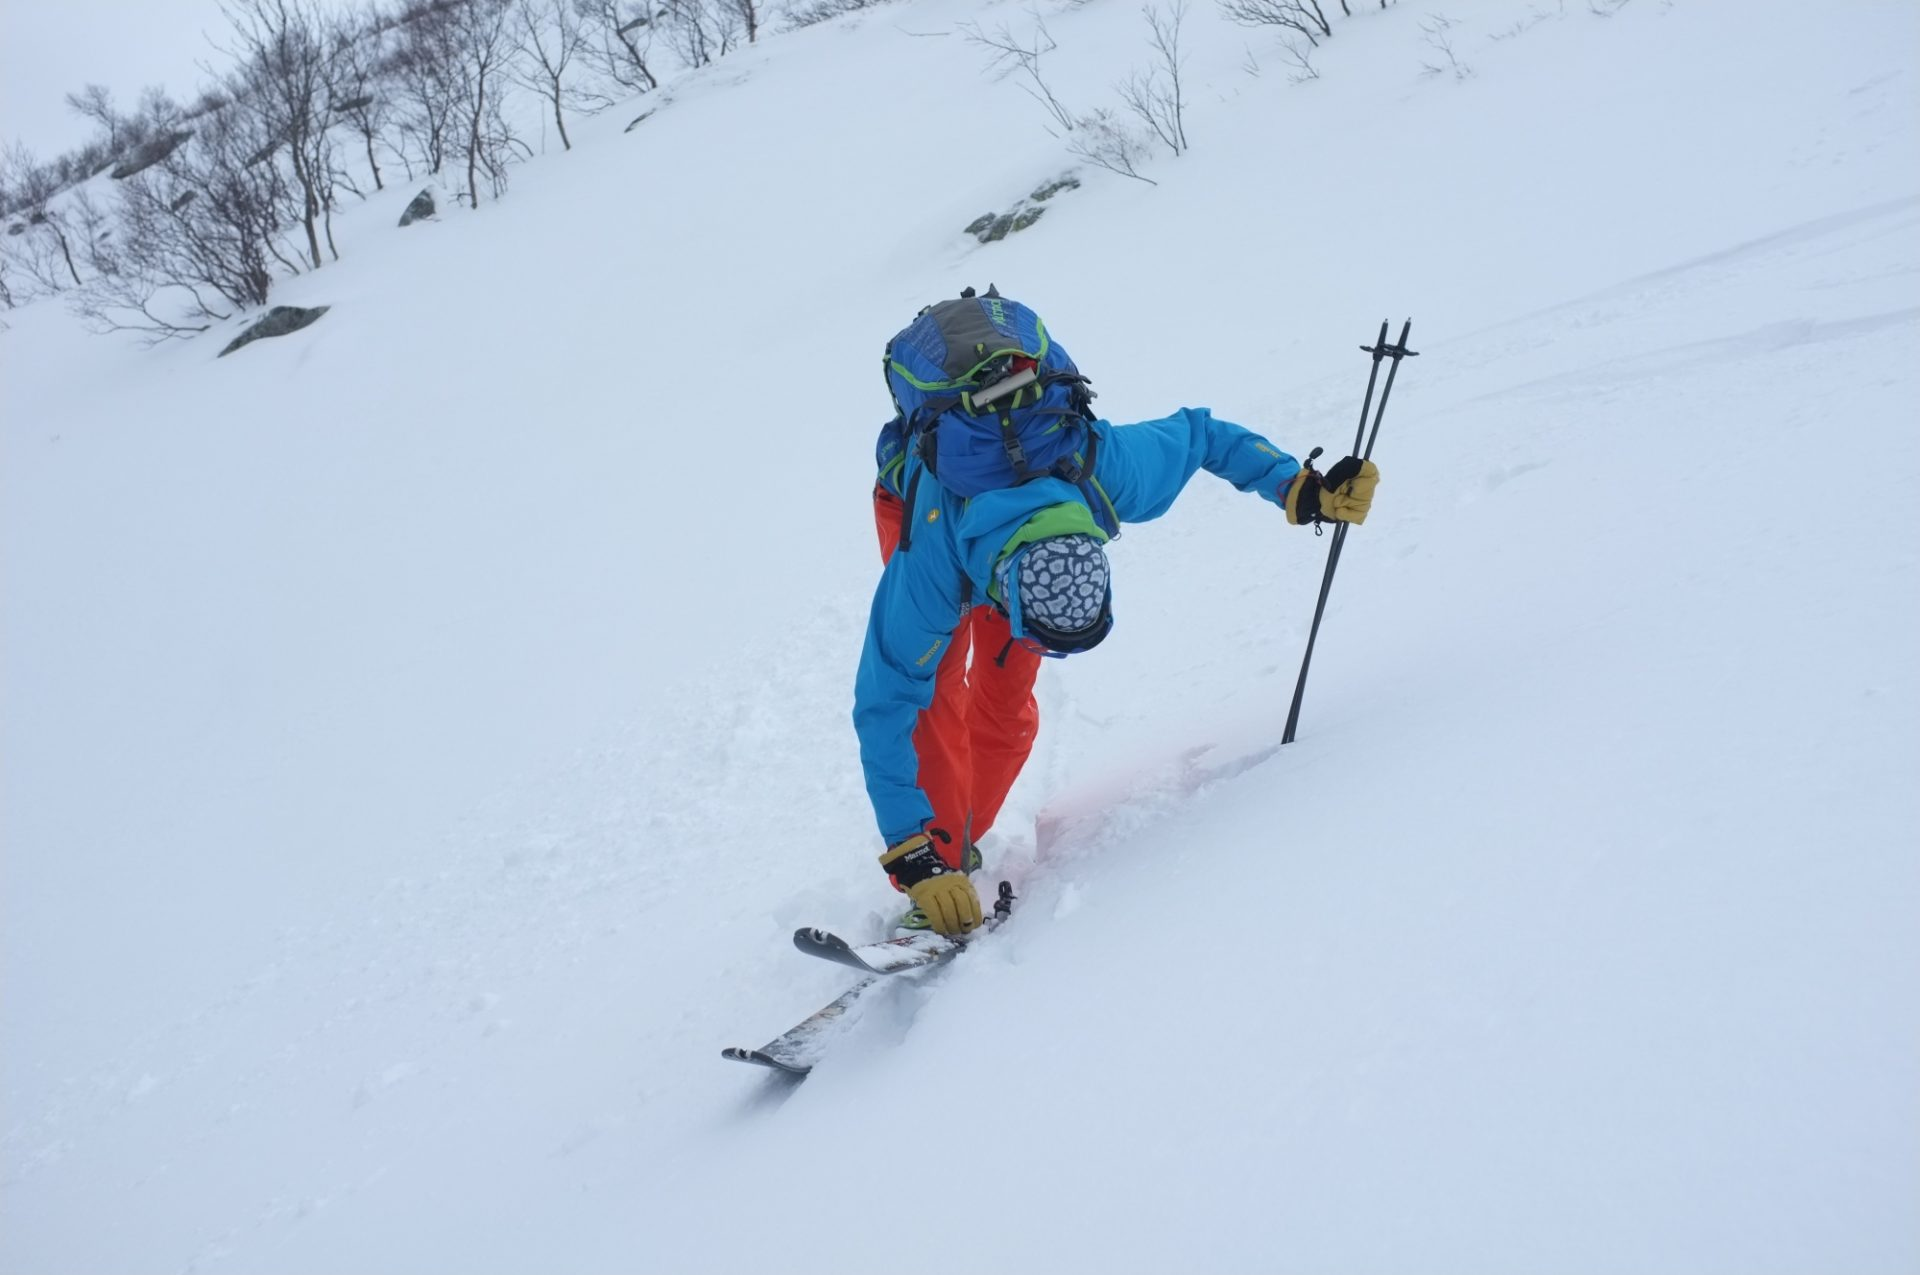 Bergsteigertipp Ski anziehen 3 I (c) Peter Plattner